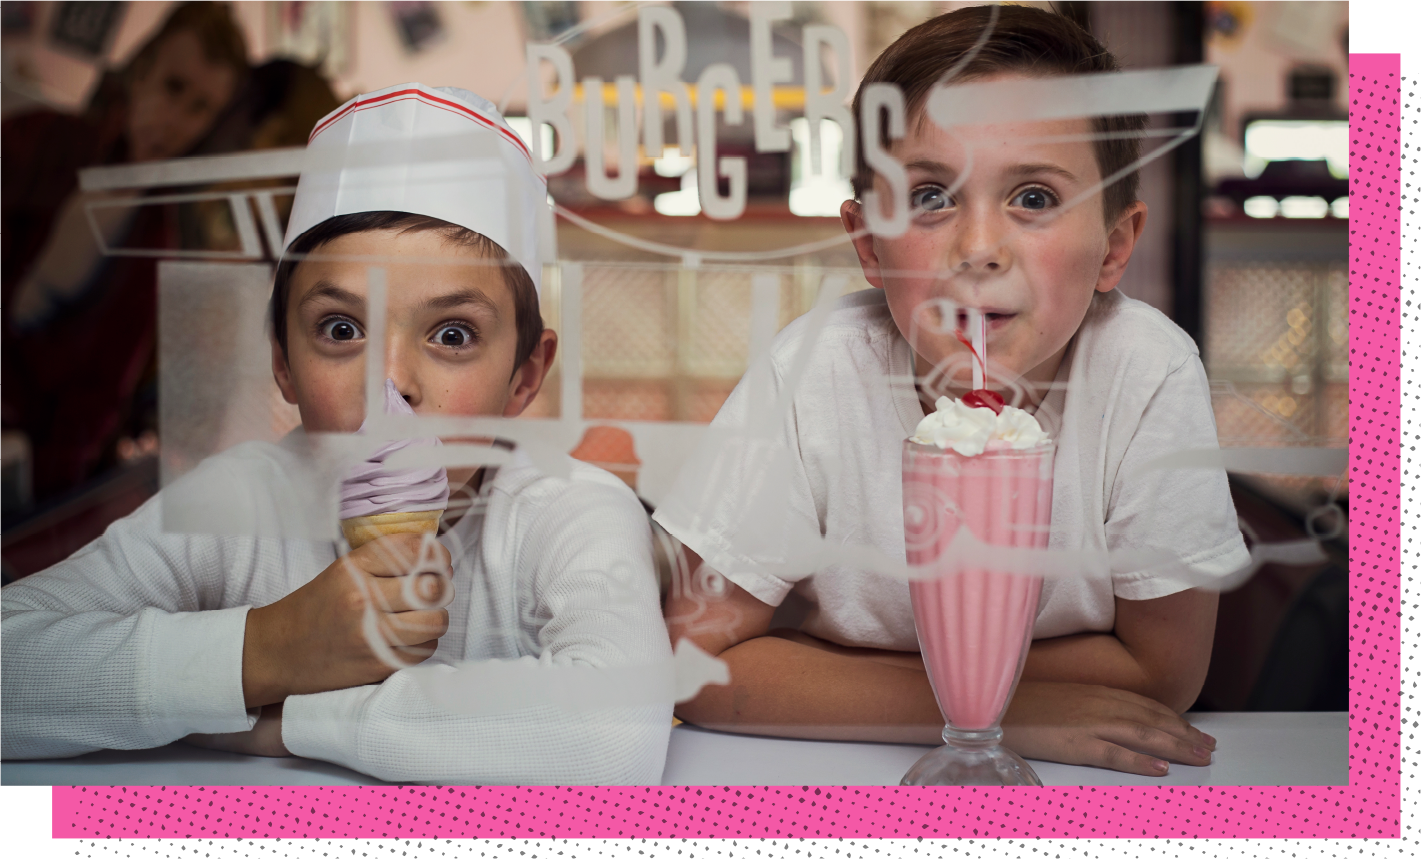 2 boys eating ice cream and a milkshake